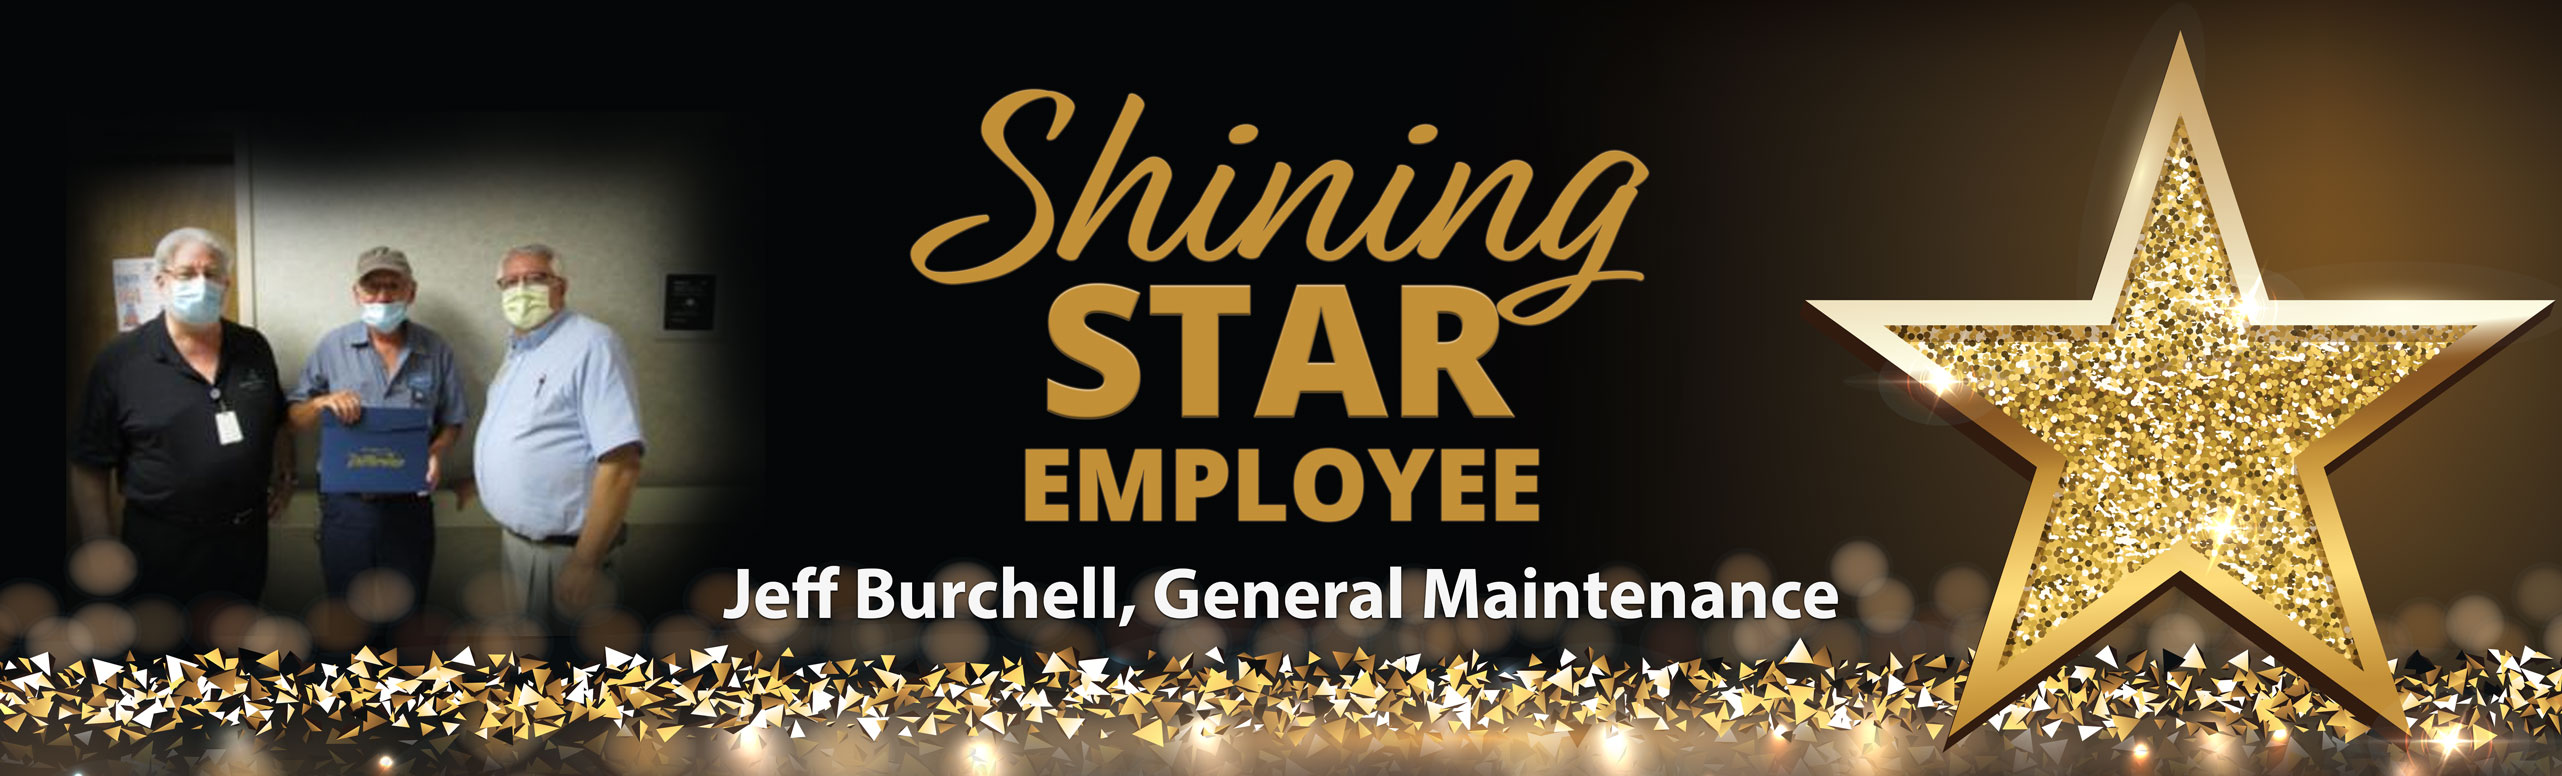 Shining Star Employee  Christie Potter, Certified Nursing Assistant